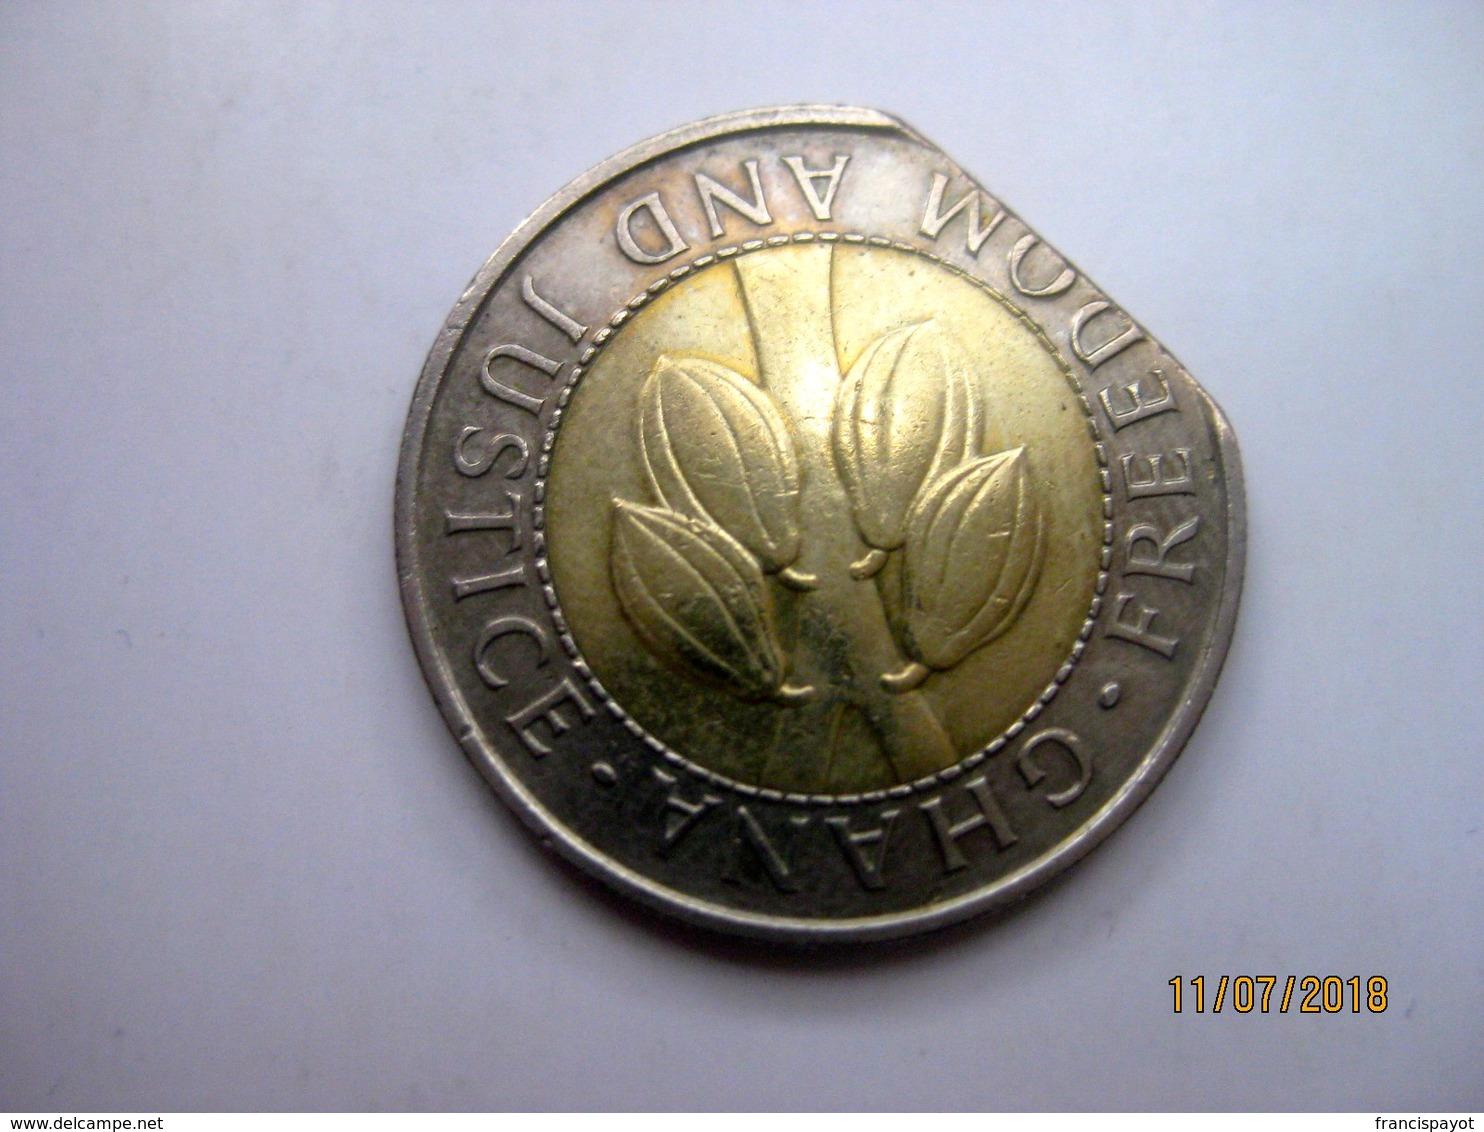 Ghana: 100 Cedi 1991 - Mint Clip - Ghana